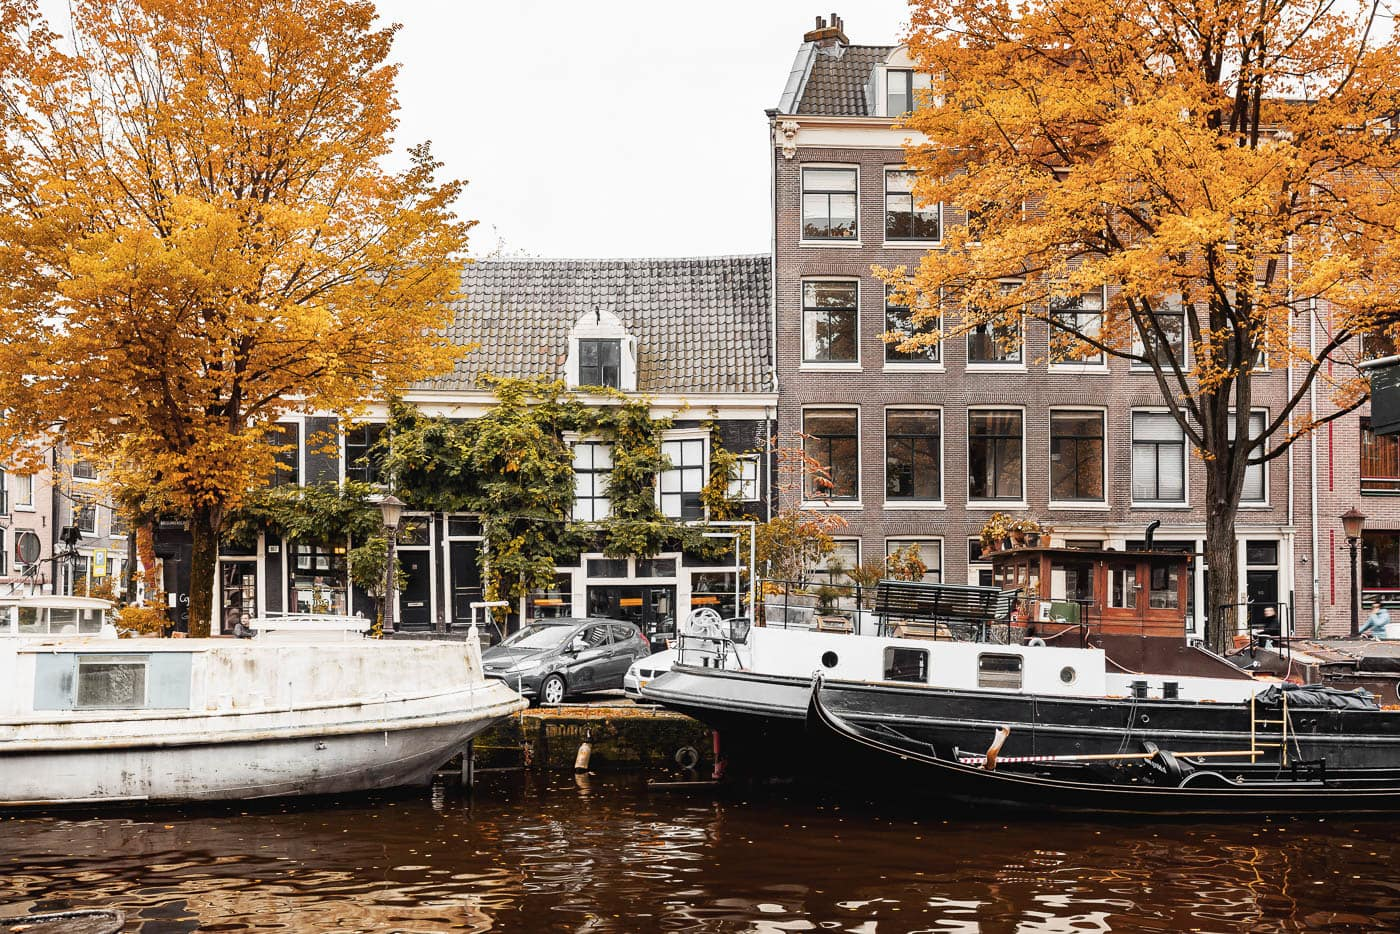 Herbst in der Brouwersgracht in Amsterdam, Niederlande